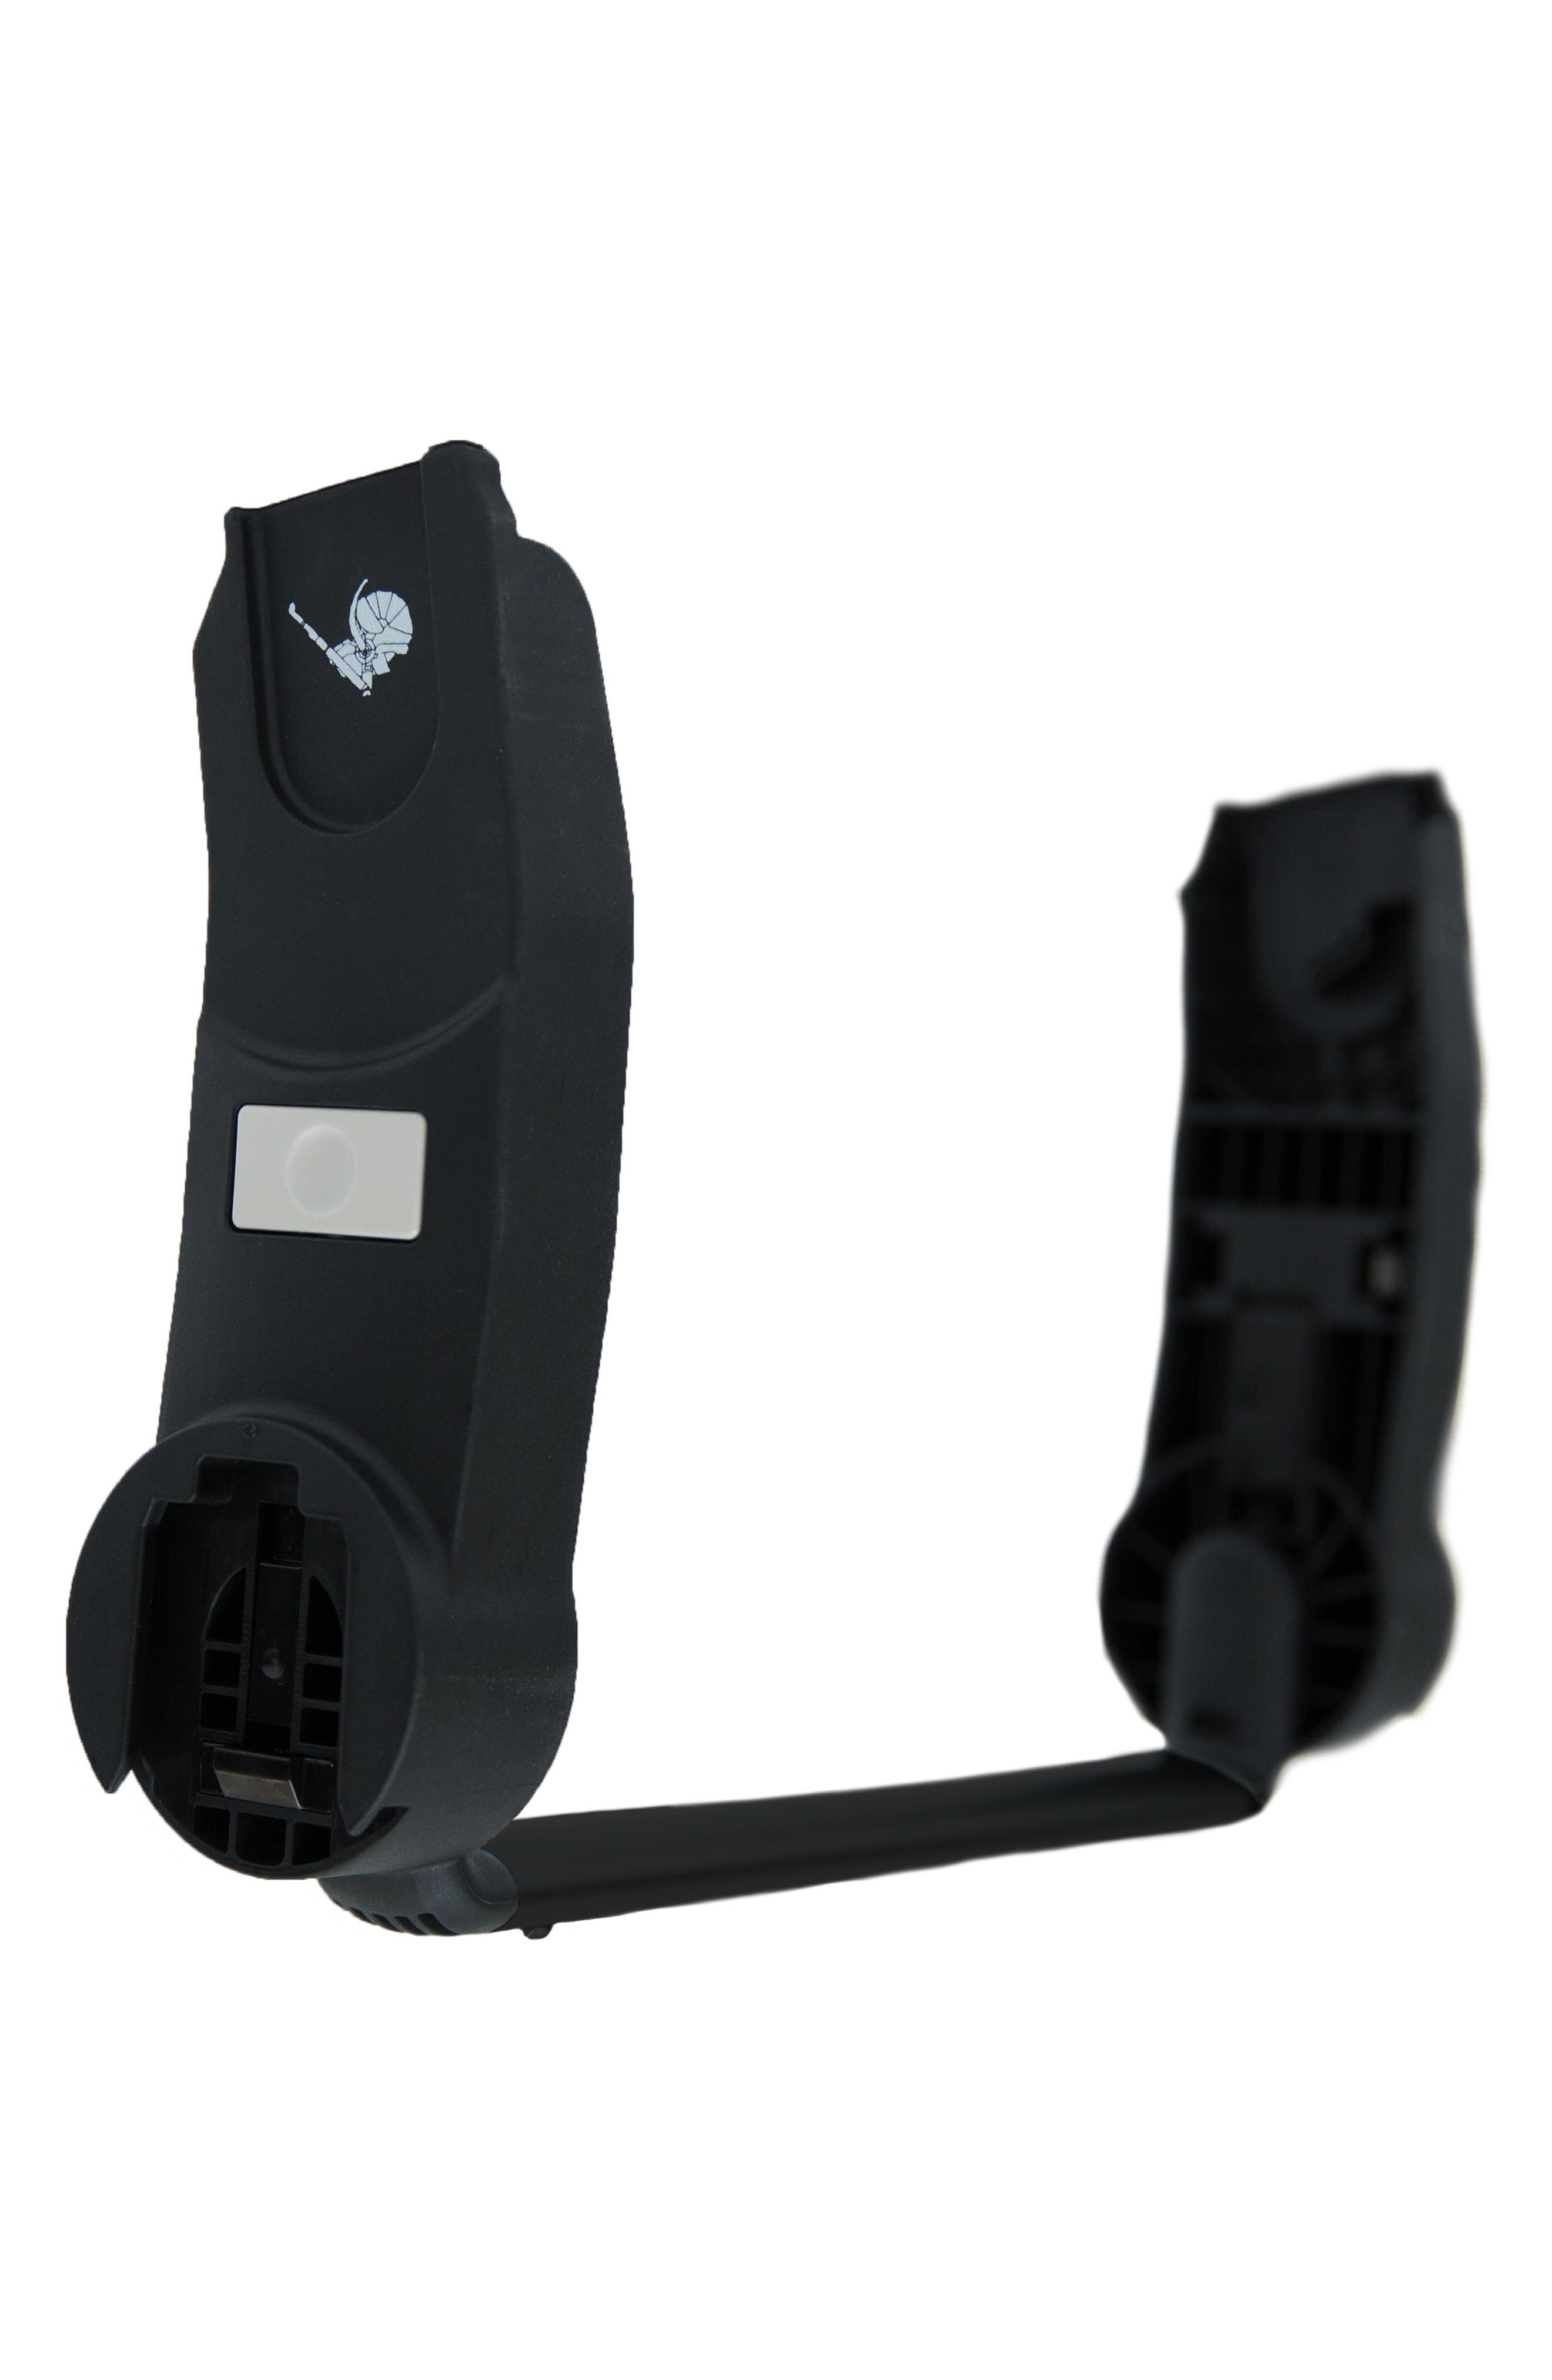 HUB Stroller to Maxi Cosi/Nuna/Aton/Cybex/CabrioFix Infant Car Seat Adapter,                         Main,                         color, BLACK